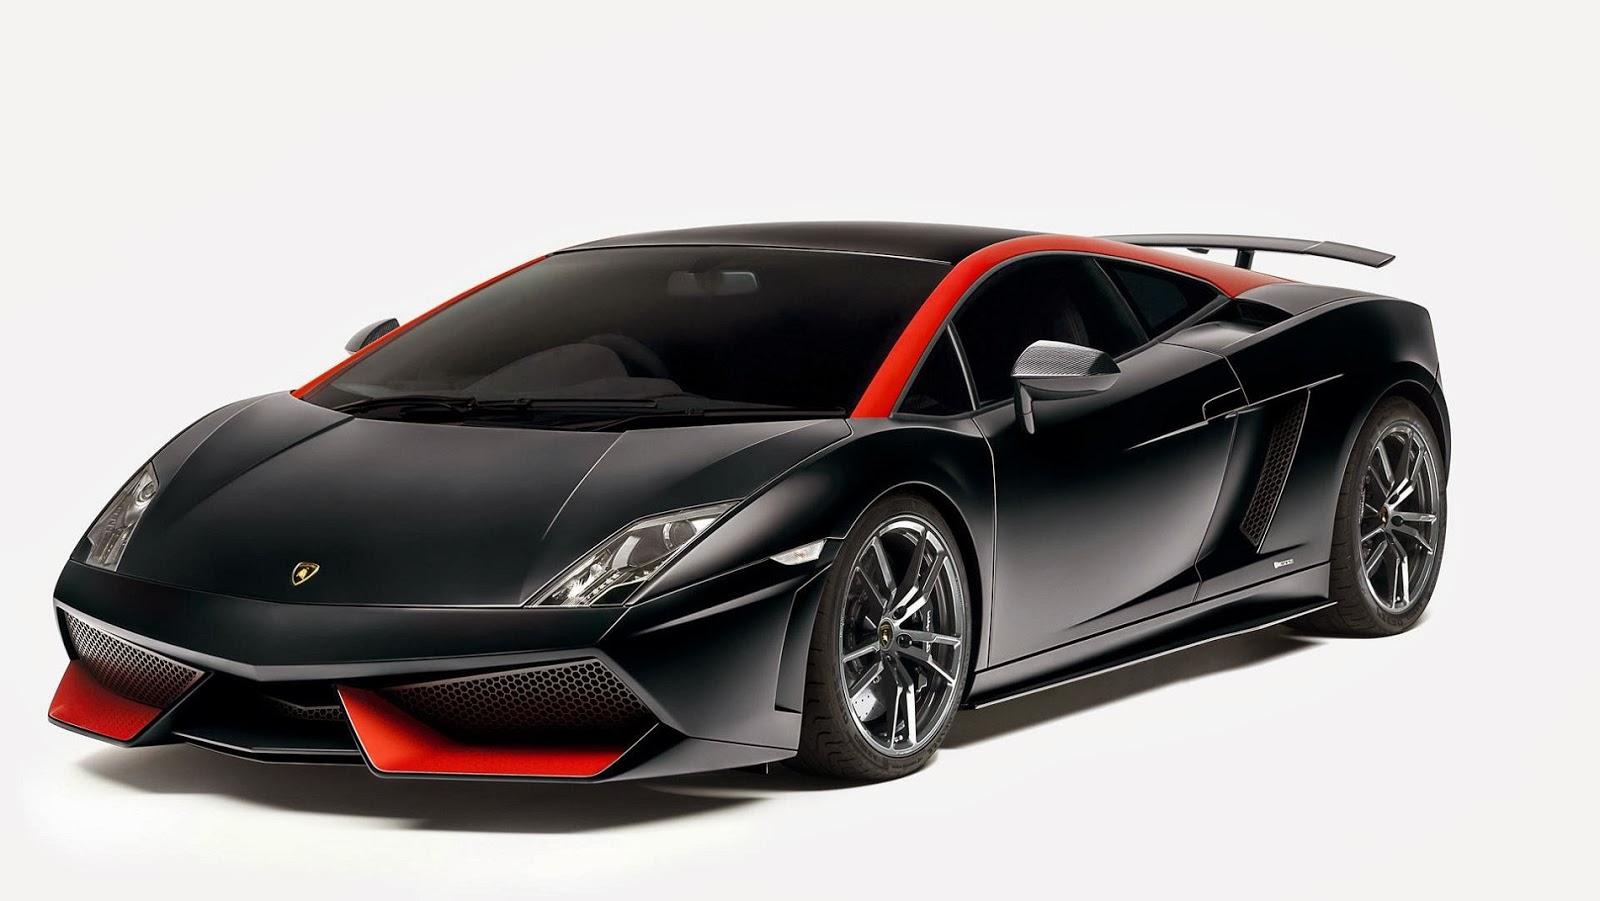 Red And Black Lamborghini Wallpaper 27 Hd